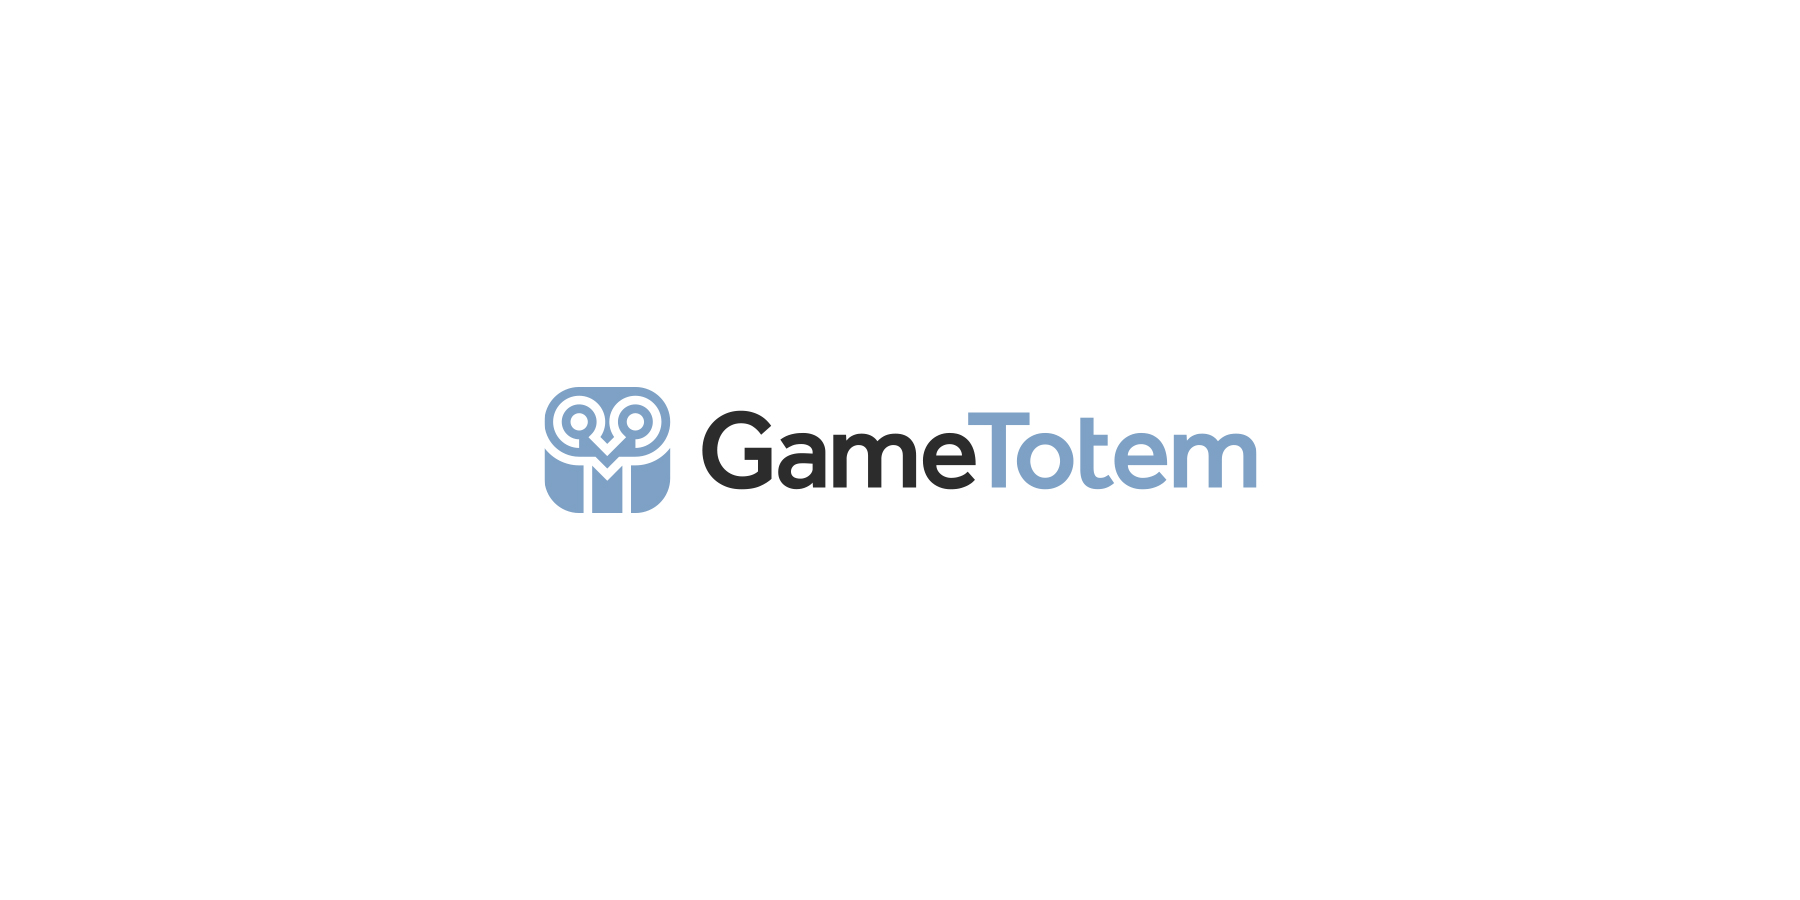 gametotem-logo-design-01